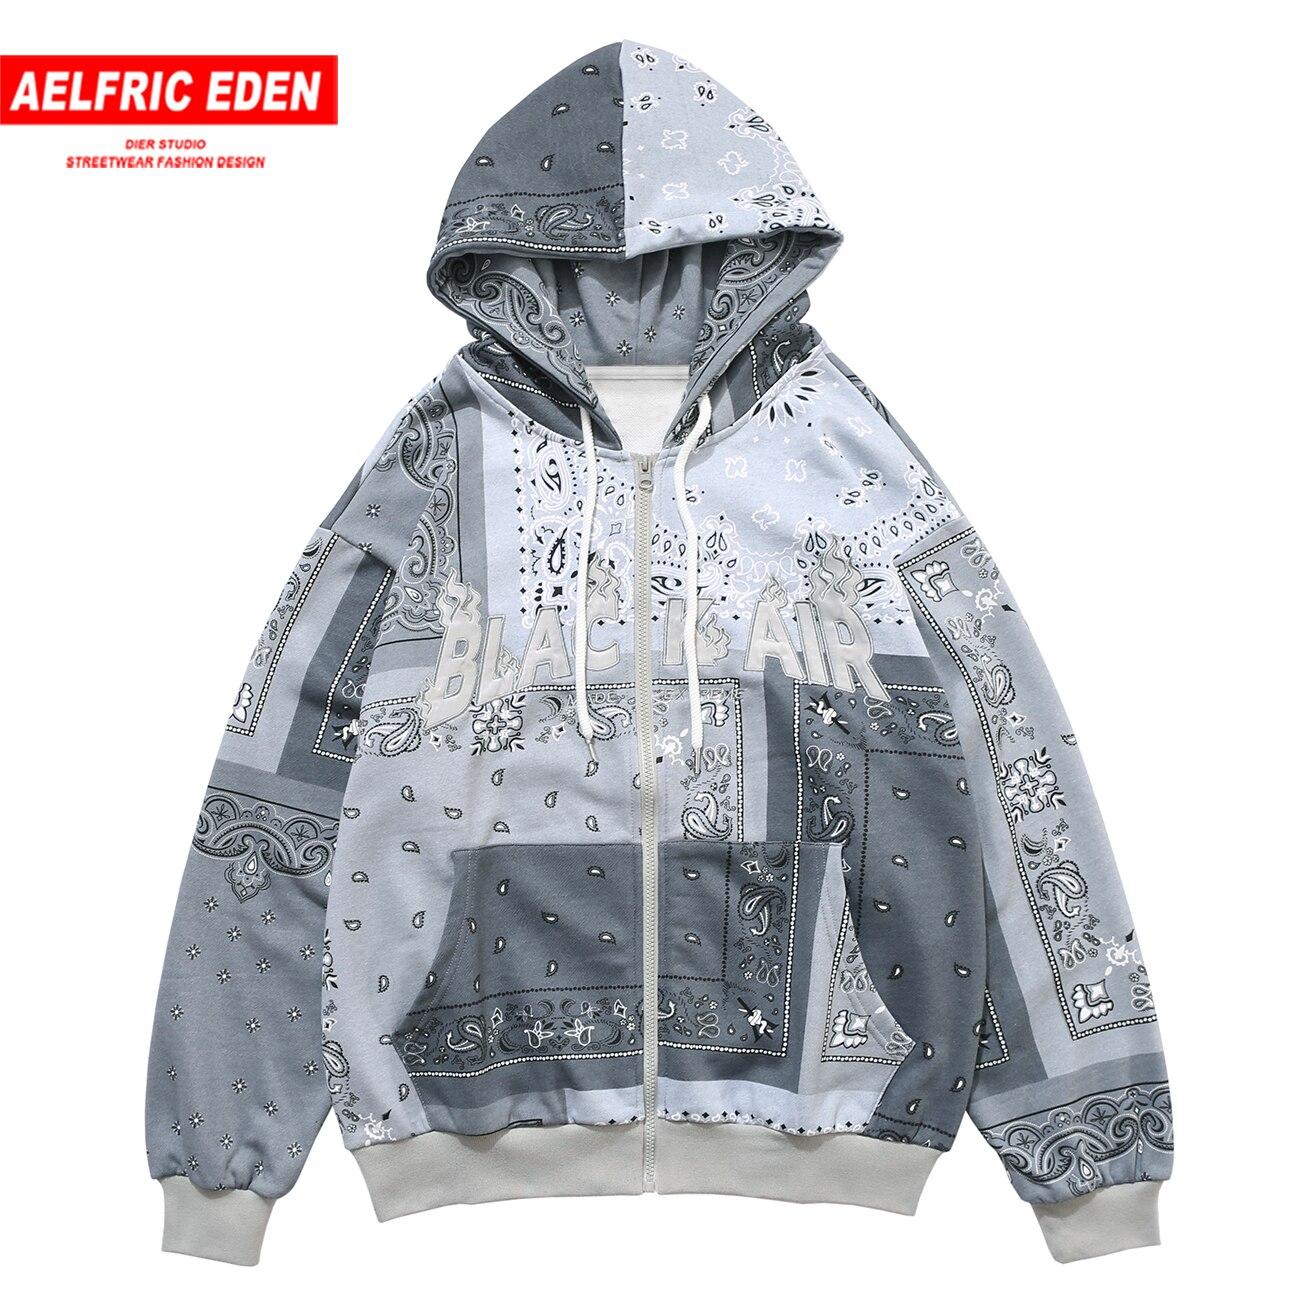 Aelfric Eden Vintage Hip Hop Hoodie Sweatshirt Jacket Streetwear Casual Hoodies Coats Autumn Harajuku Hoodie Mens Open Front Zip